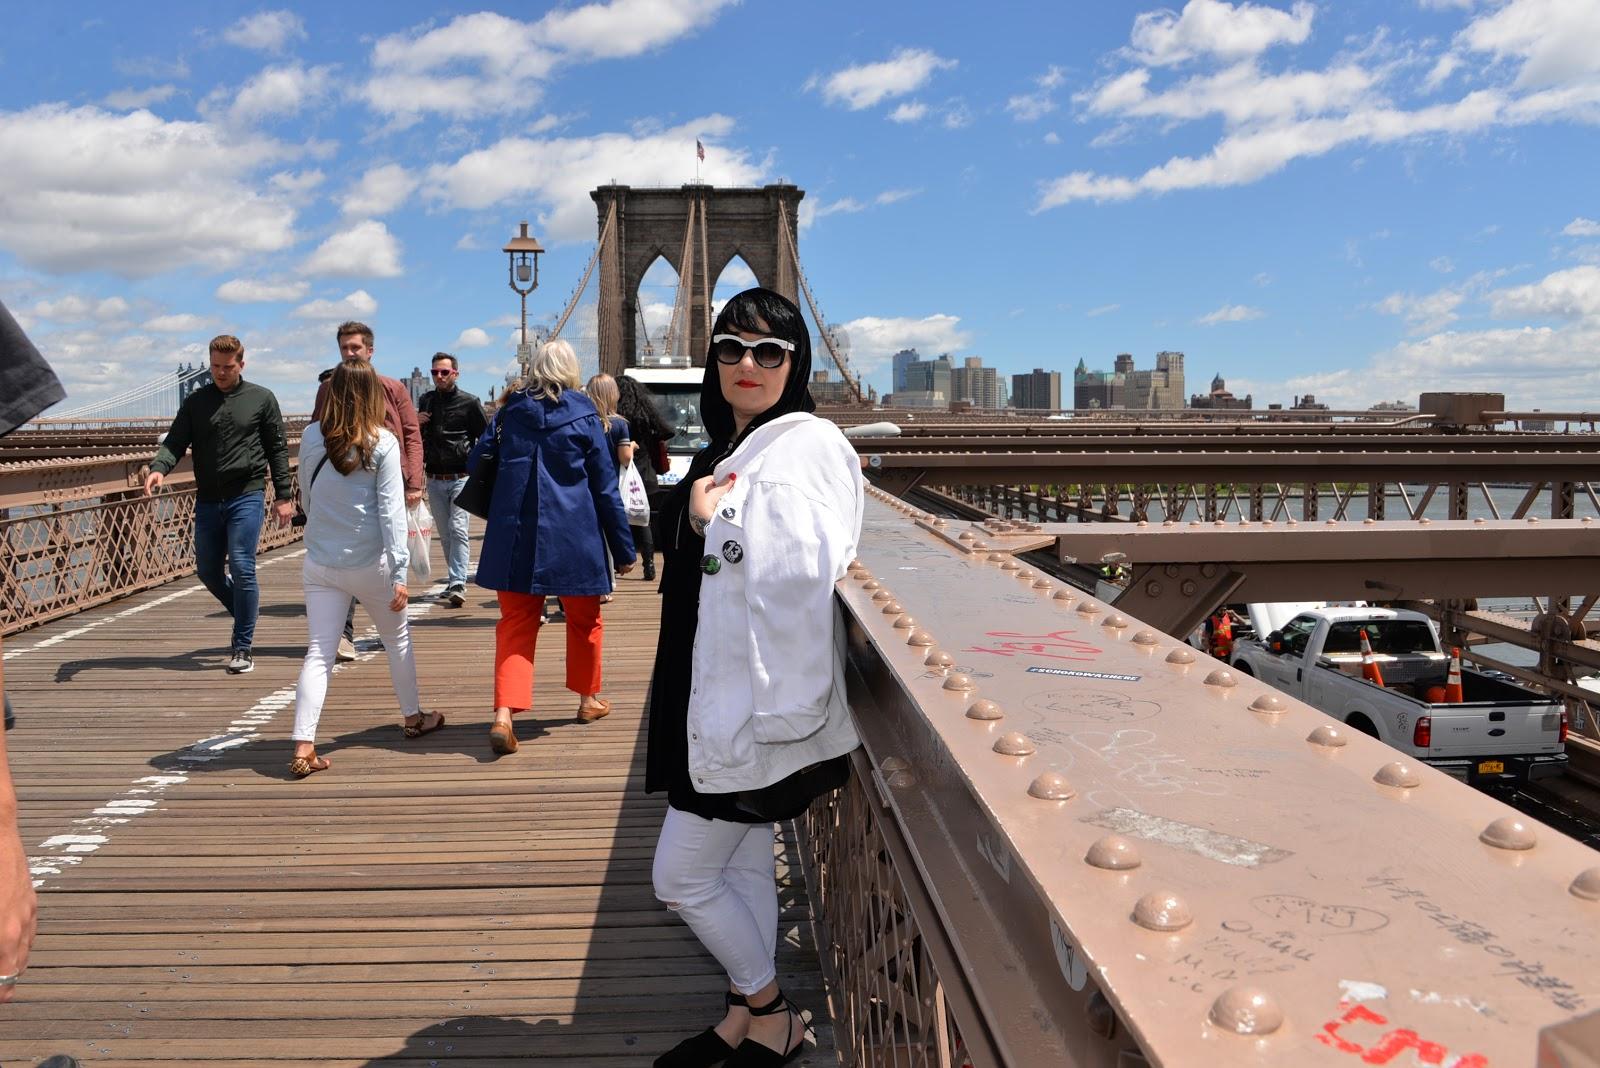 Blackandwhitefashion in New York